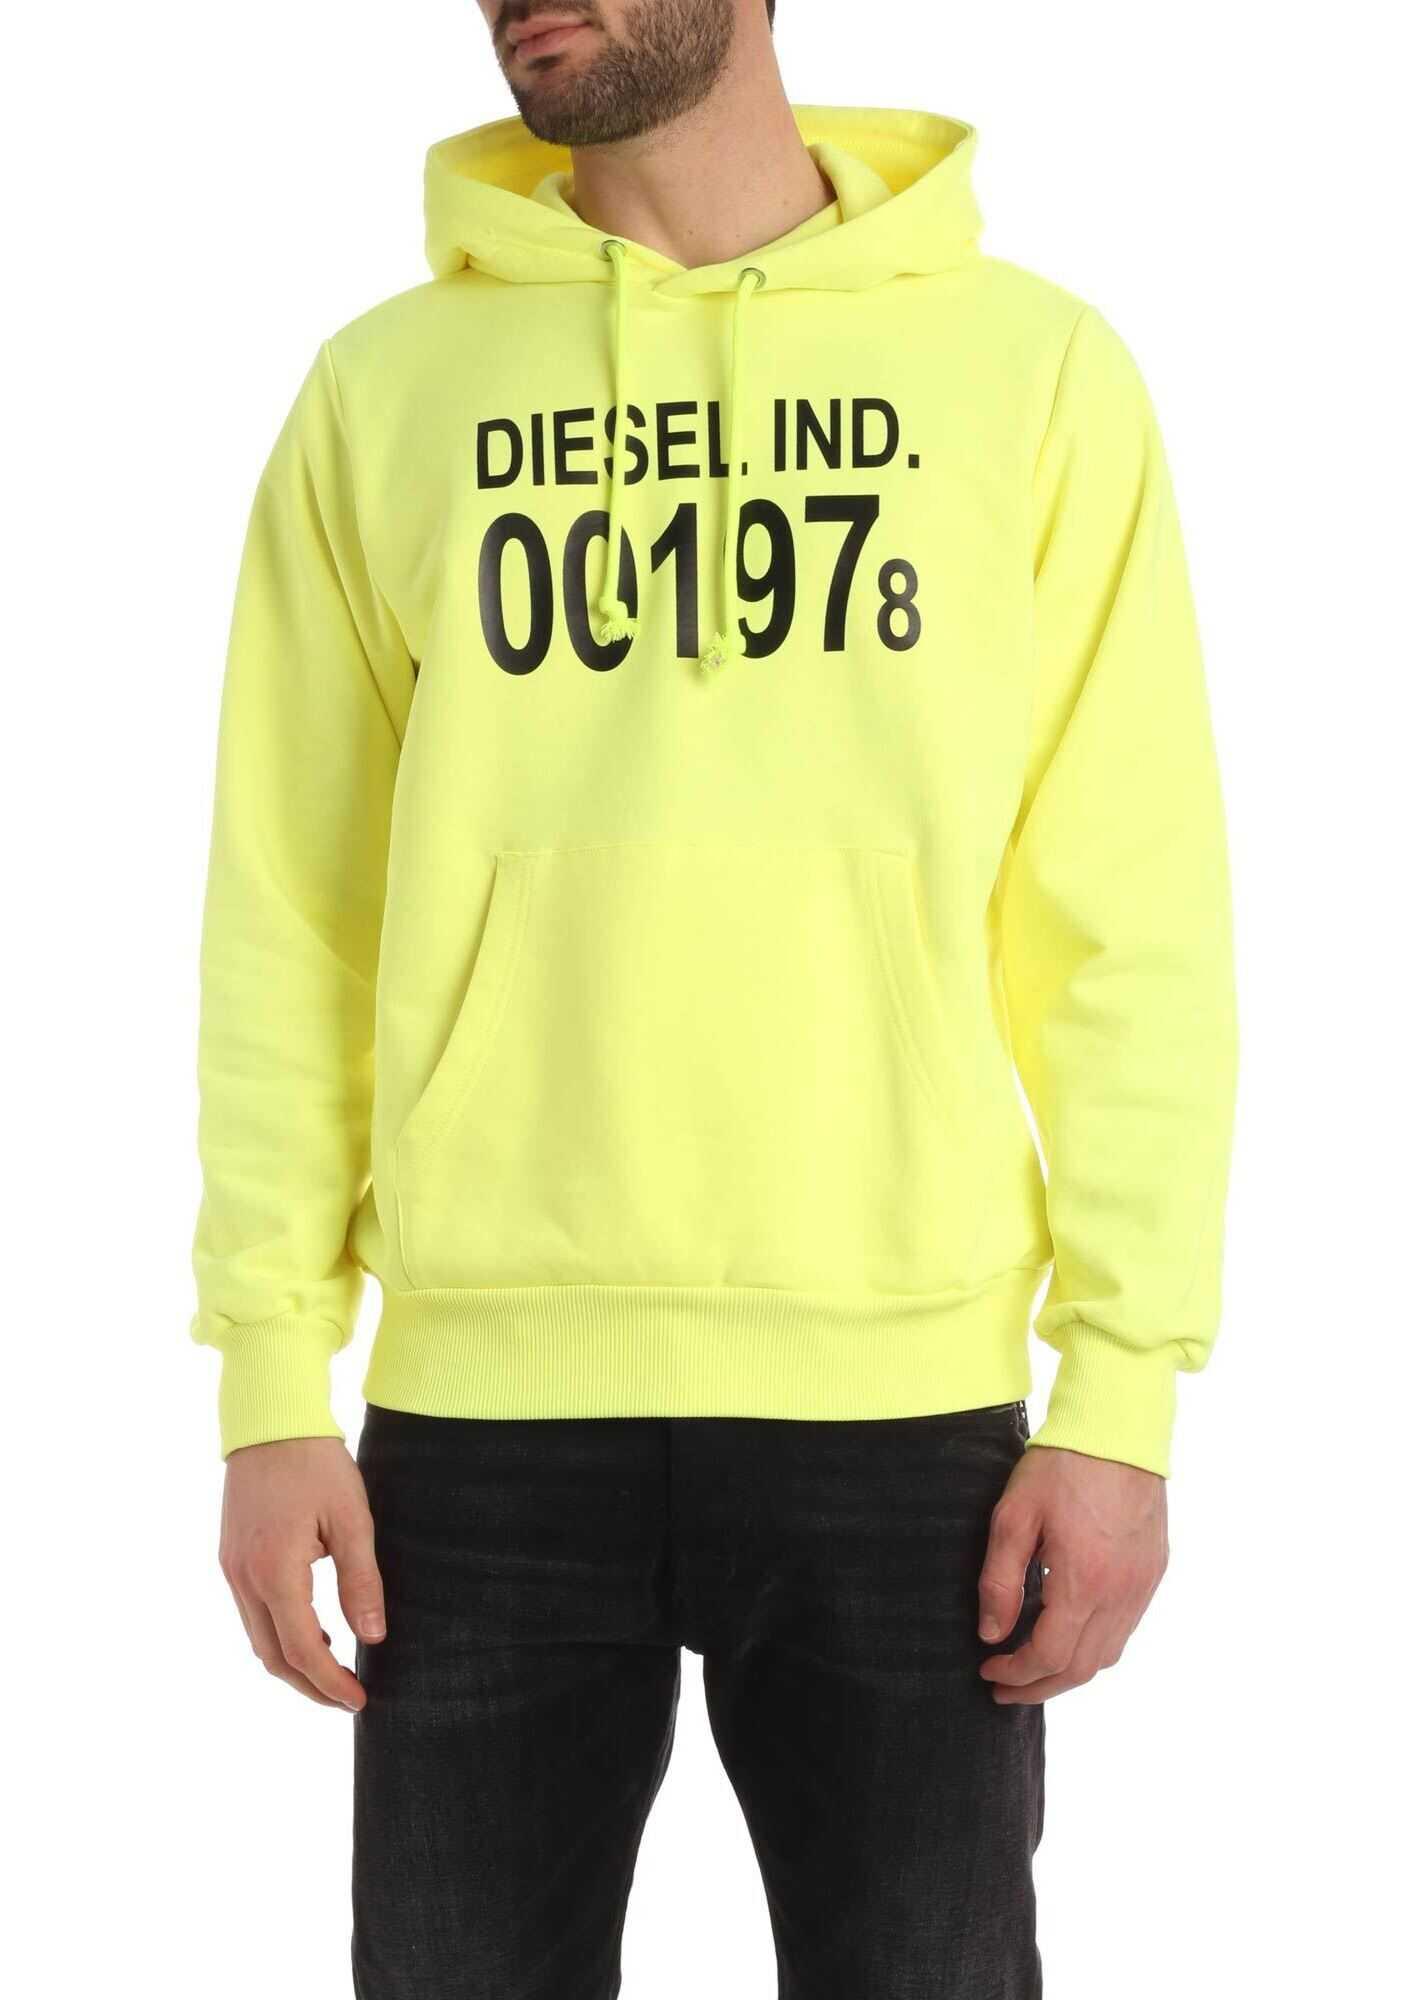 Diesel Girk Sweatshirt In Neon Yellow Yellow